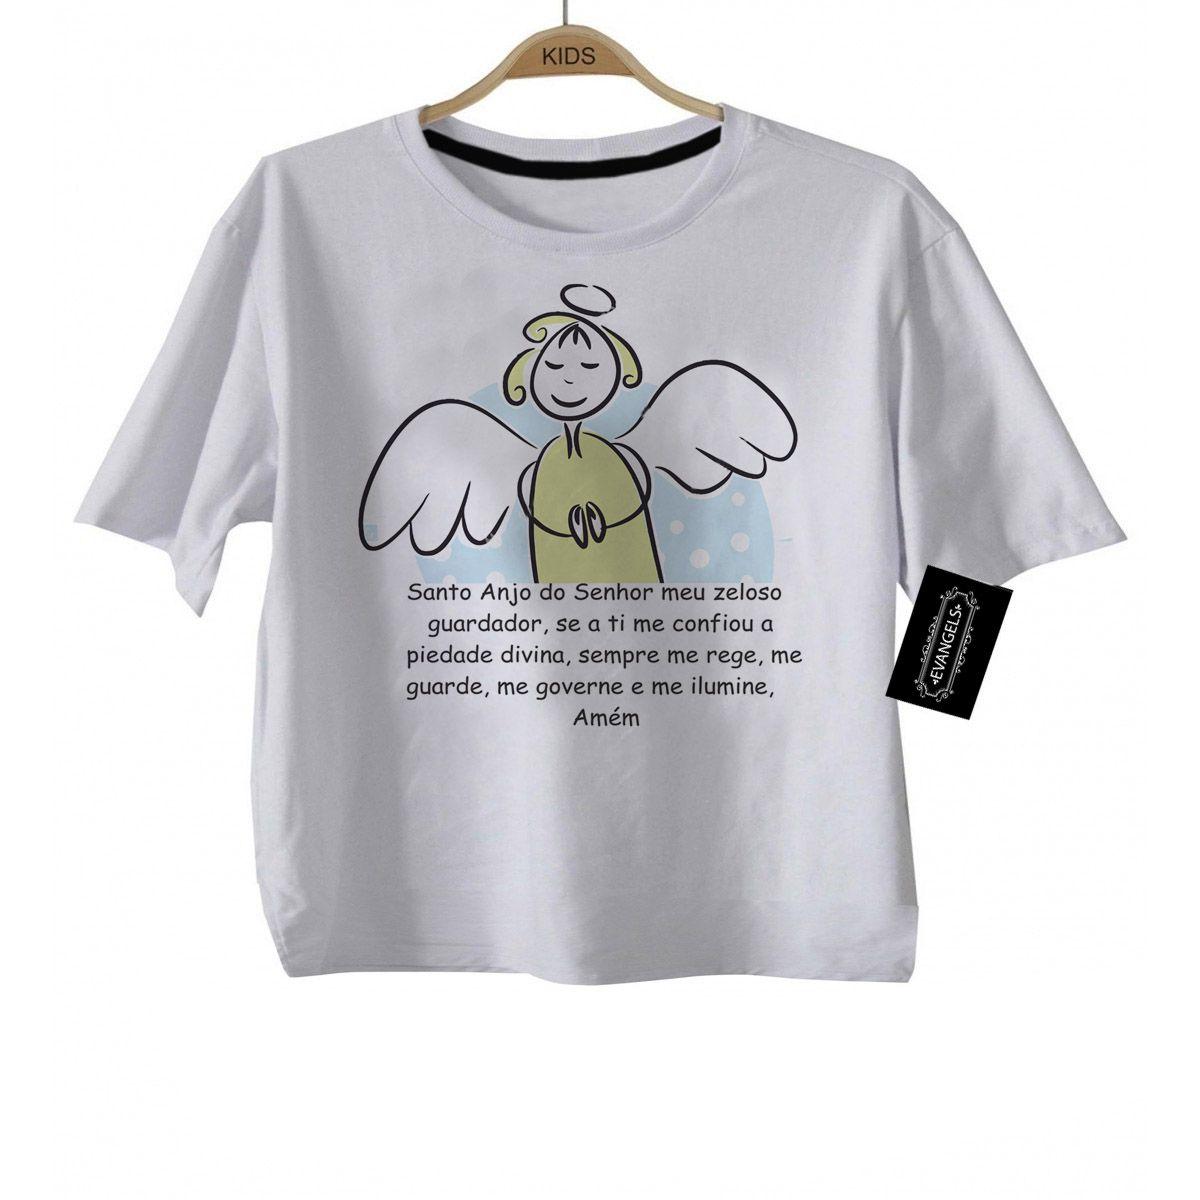 Camiseta Kids  Católica Santo Anjo - white  - Baby Monster S/A